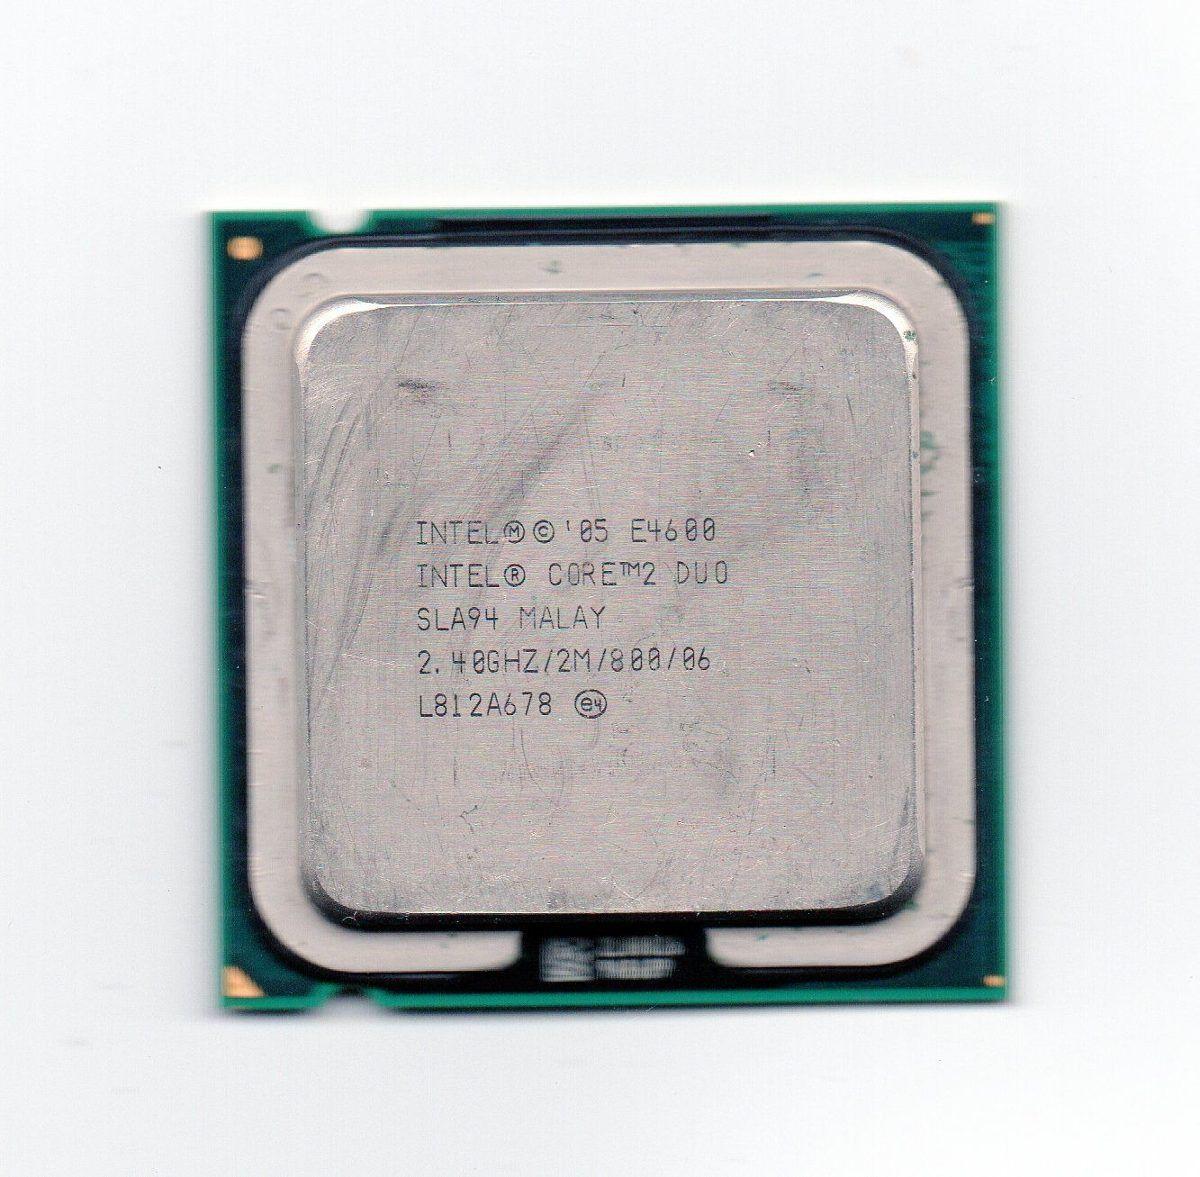 CPU 775 | CORE 2 DUO E4600 | SLA94 | INTEL | 2.40GHZ